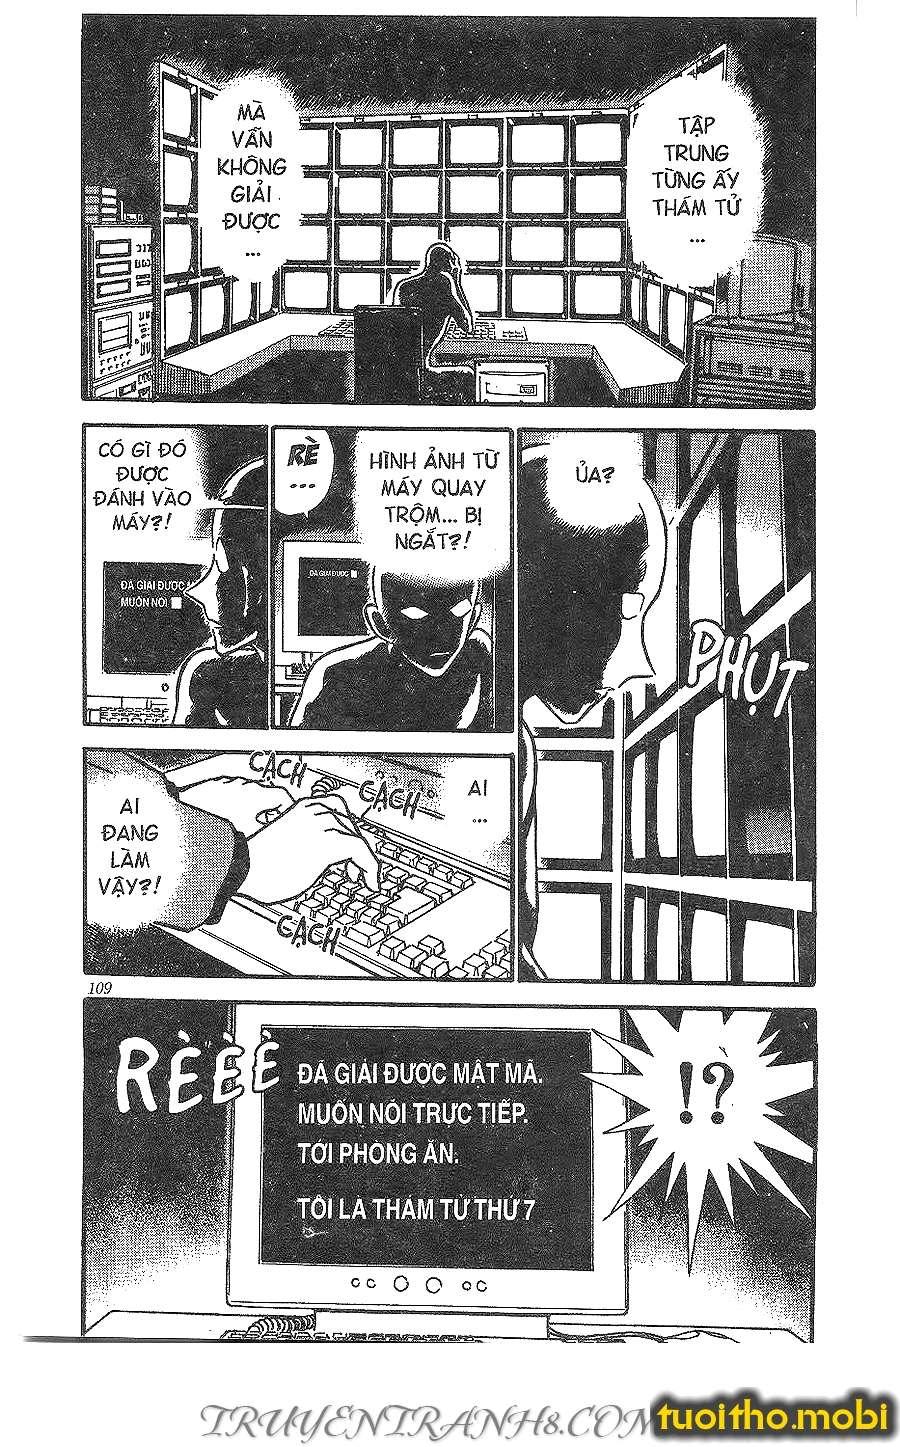 conan chương 302 trang 3